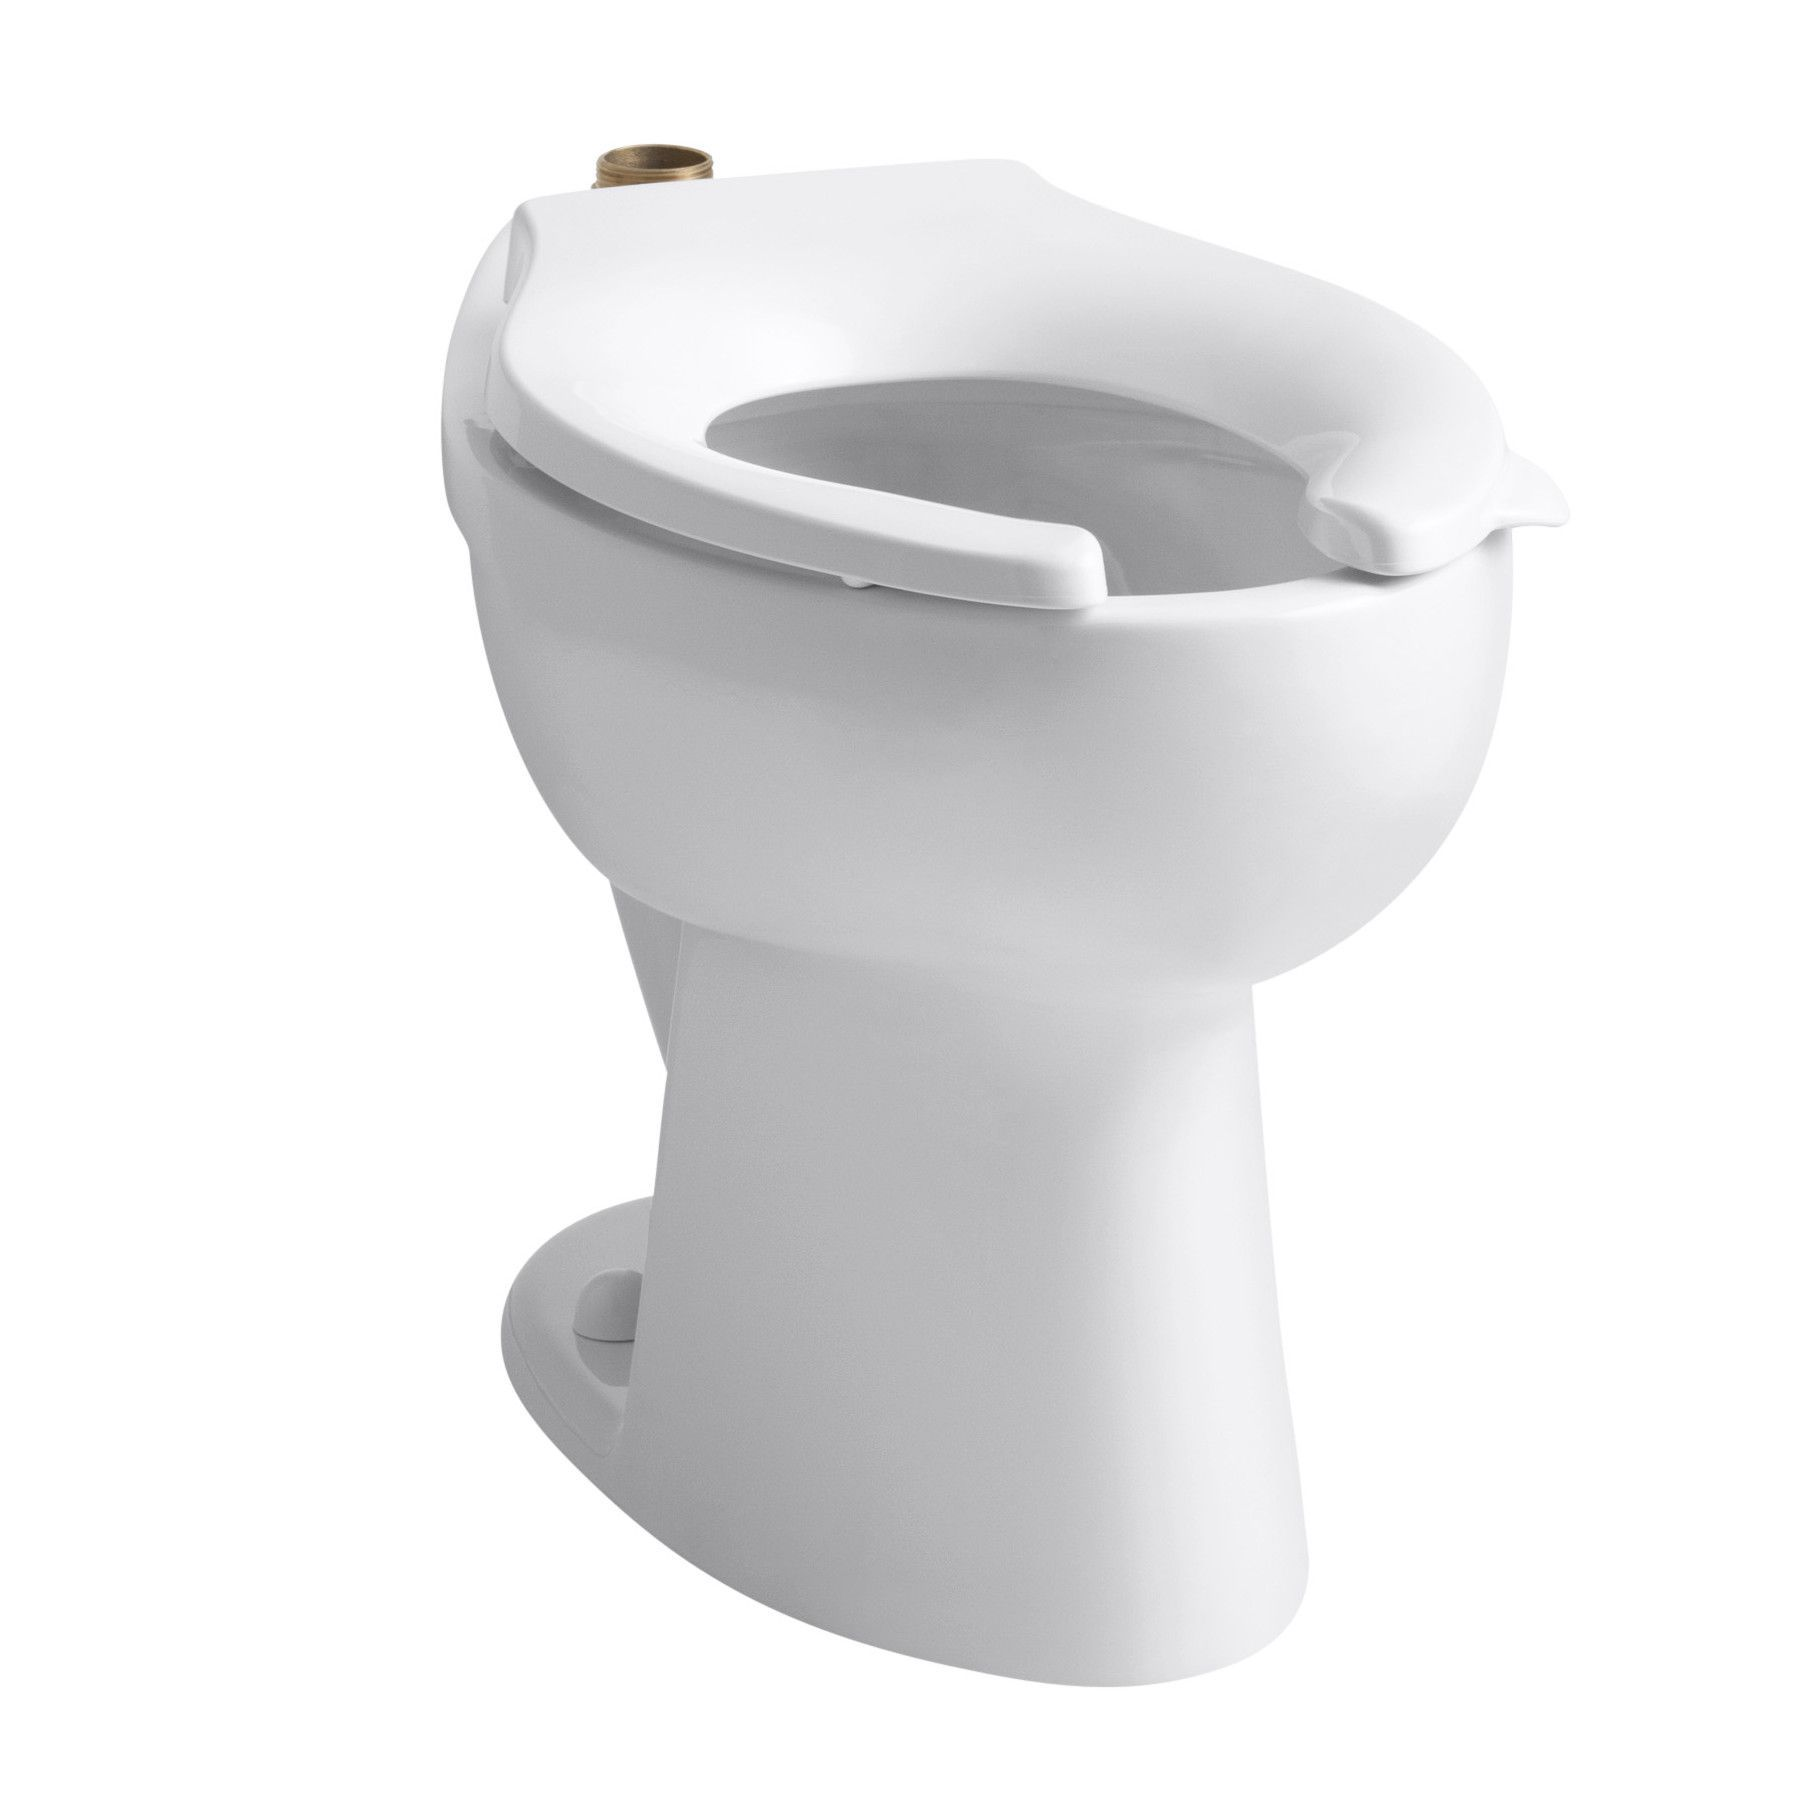 Fabulous Highcrest 1 6 Gpf 16 1 2 Ada Elongated Toilet Bowl With Top Evergreenethics Interior Chair Design Evergreenethicsorg